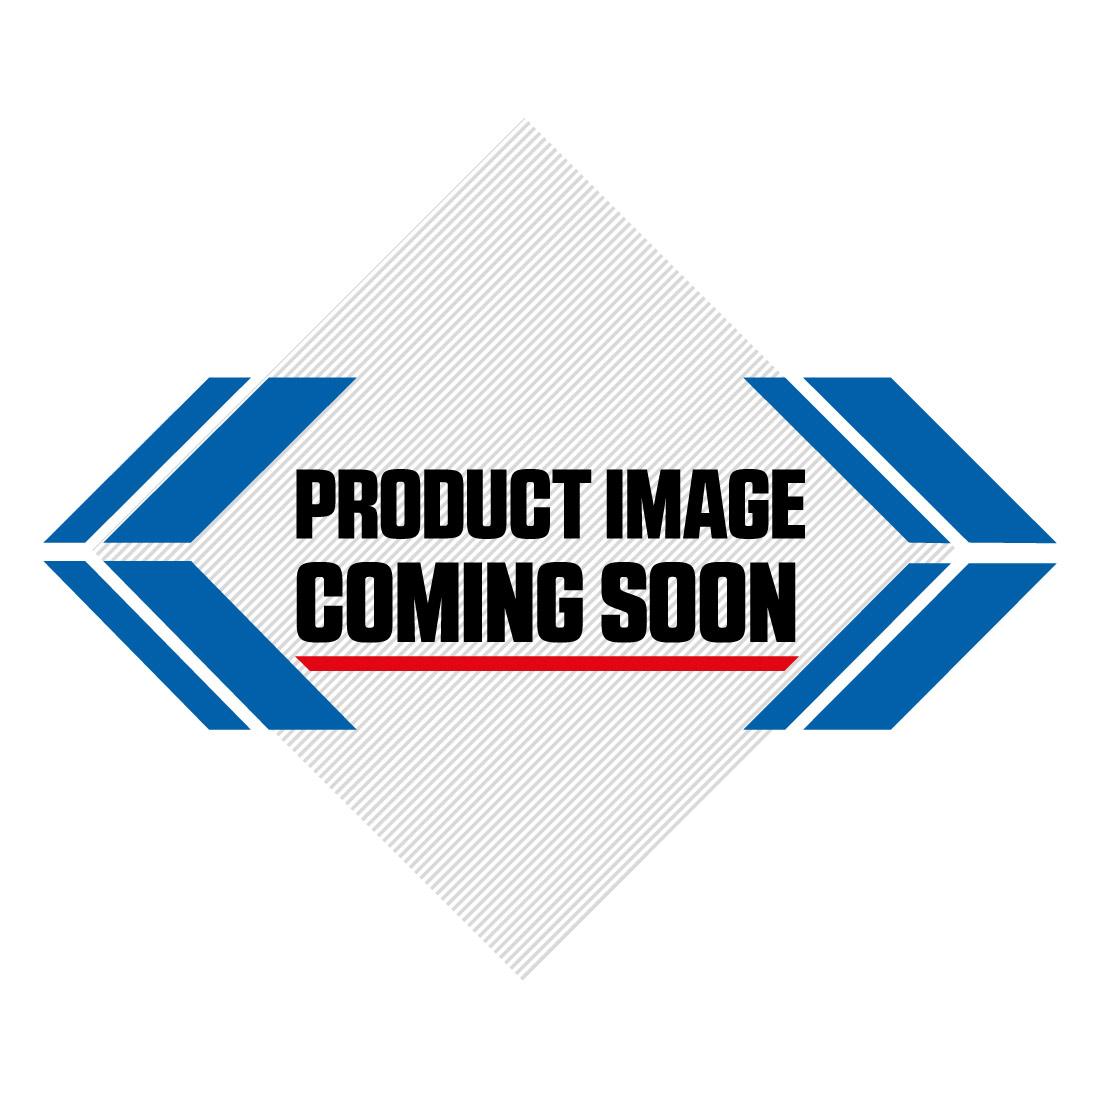 2019 UFO Interceptor 2 Helmet - Galaxy Limited Edition Image-1